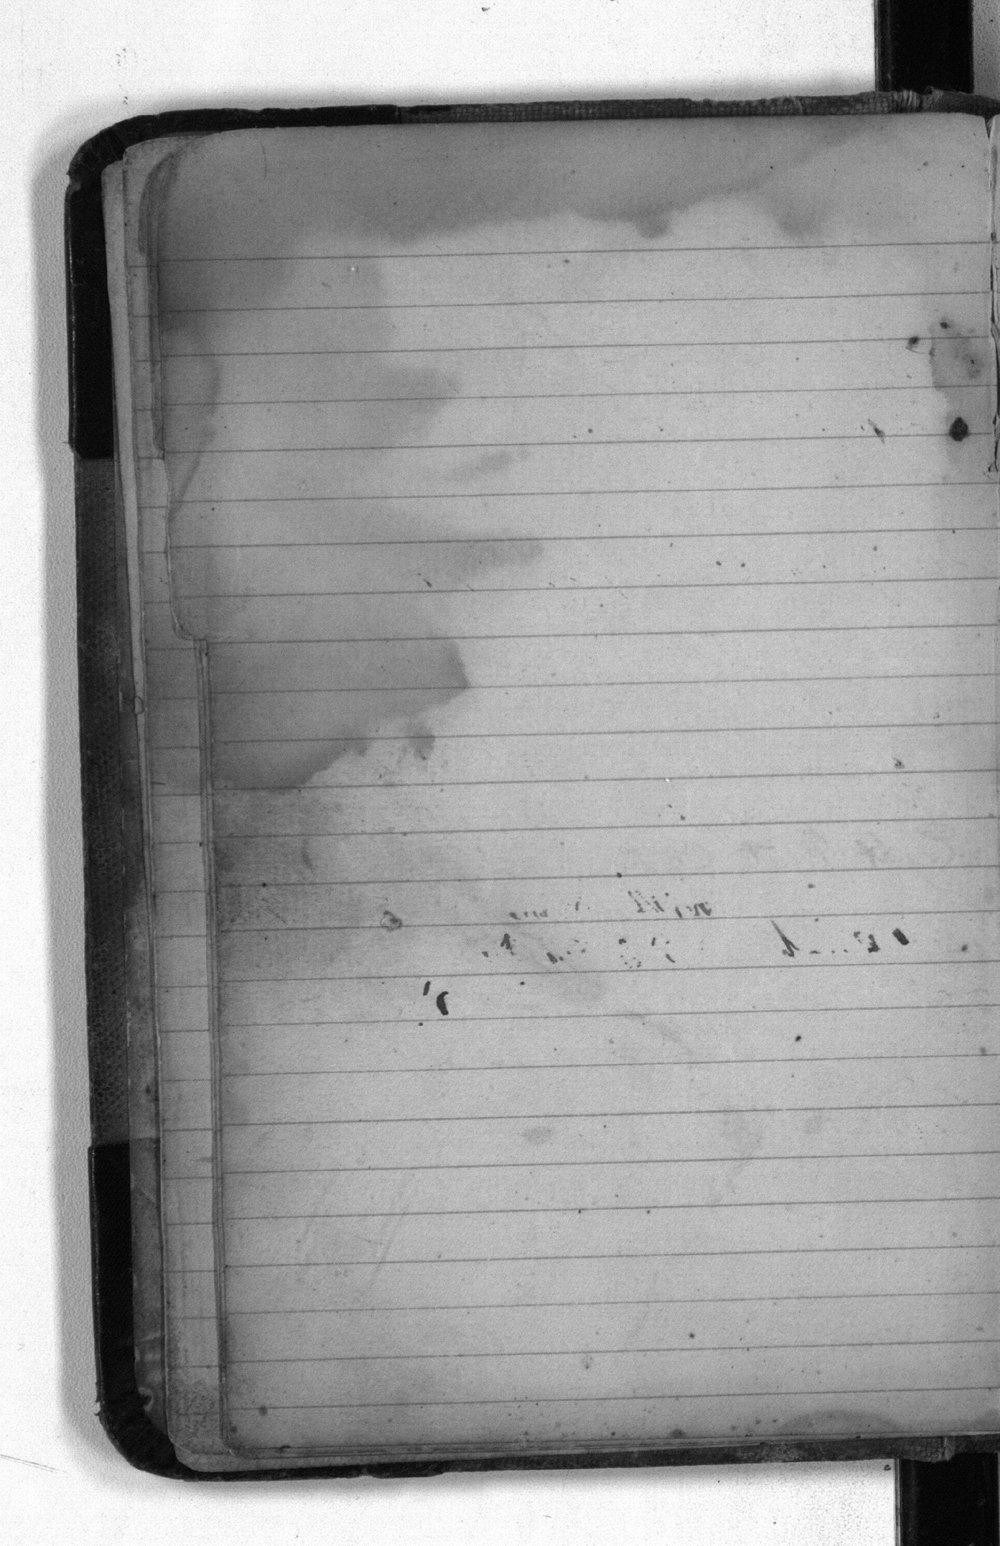 F. W. Yanner cookbook - blank page